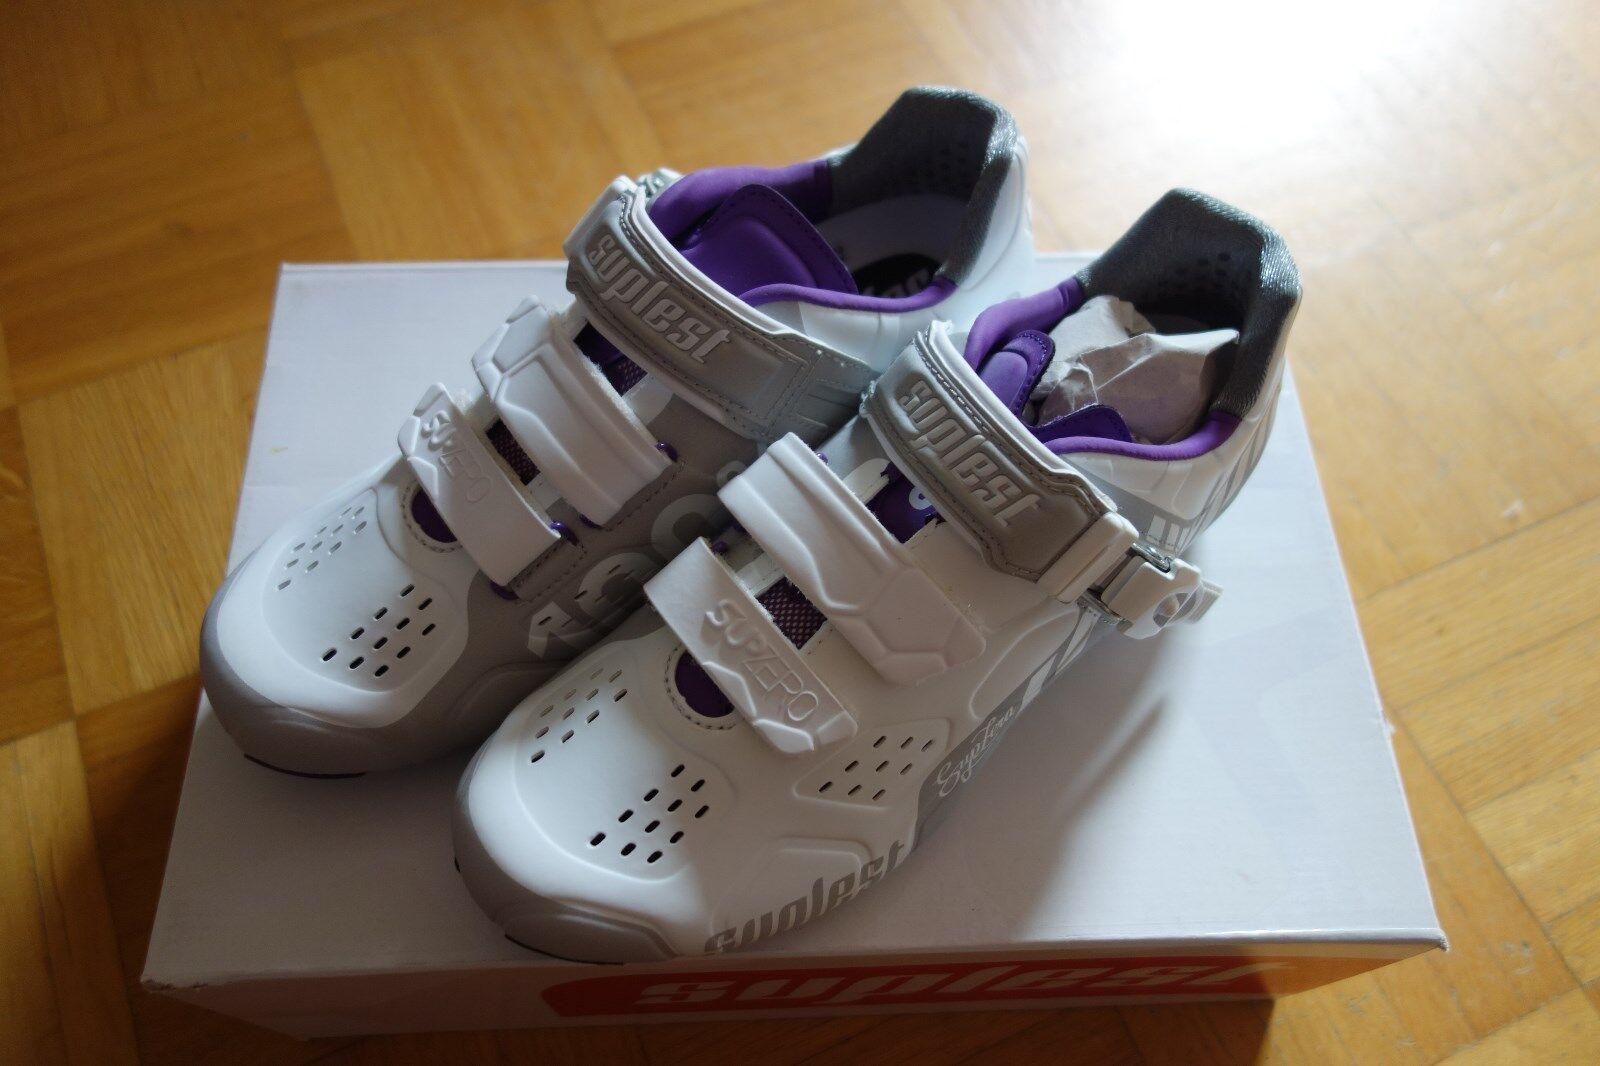 Suplest  Streetracing shoes Bici Strada Fibbia, Bianco-purple, size  37 O  large discount